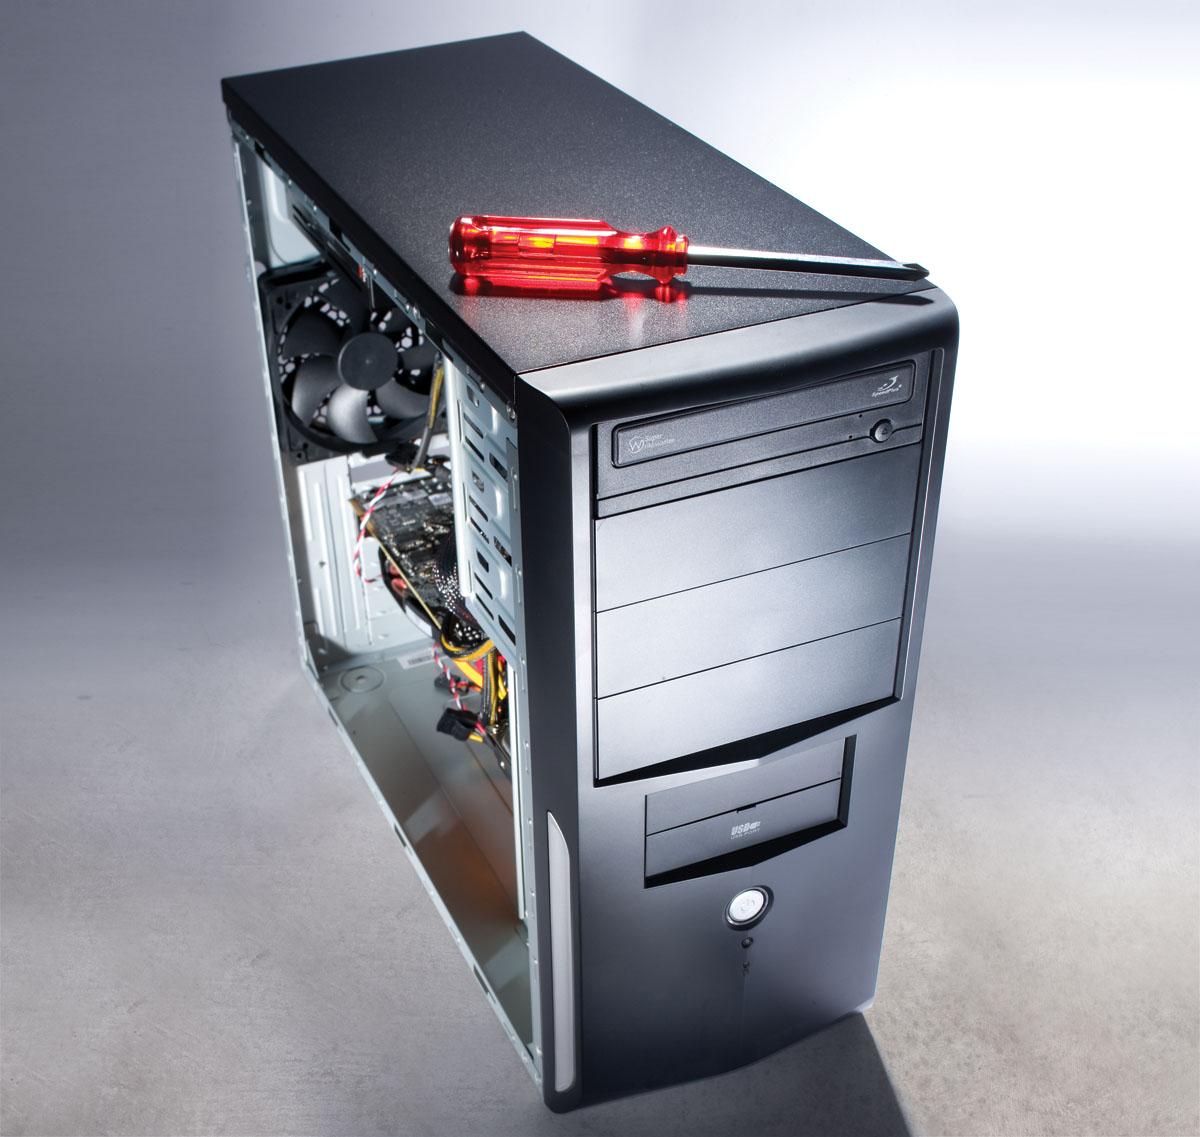 BIOS instellingen vóór installatie aanpassen